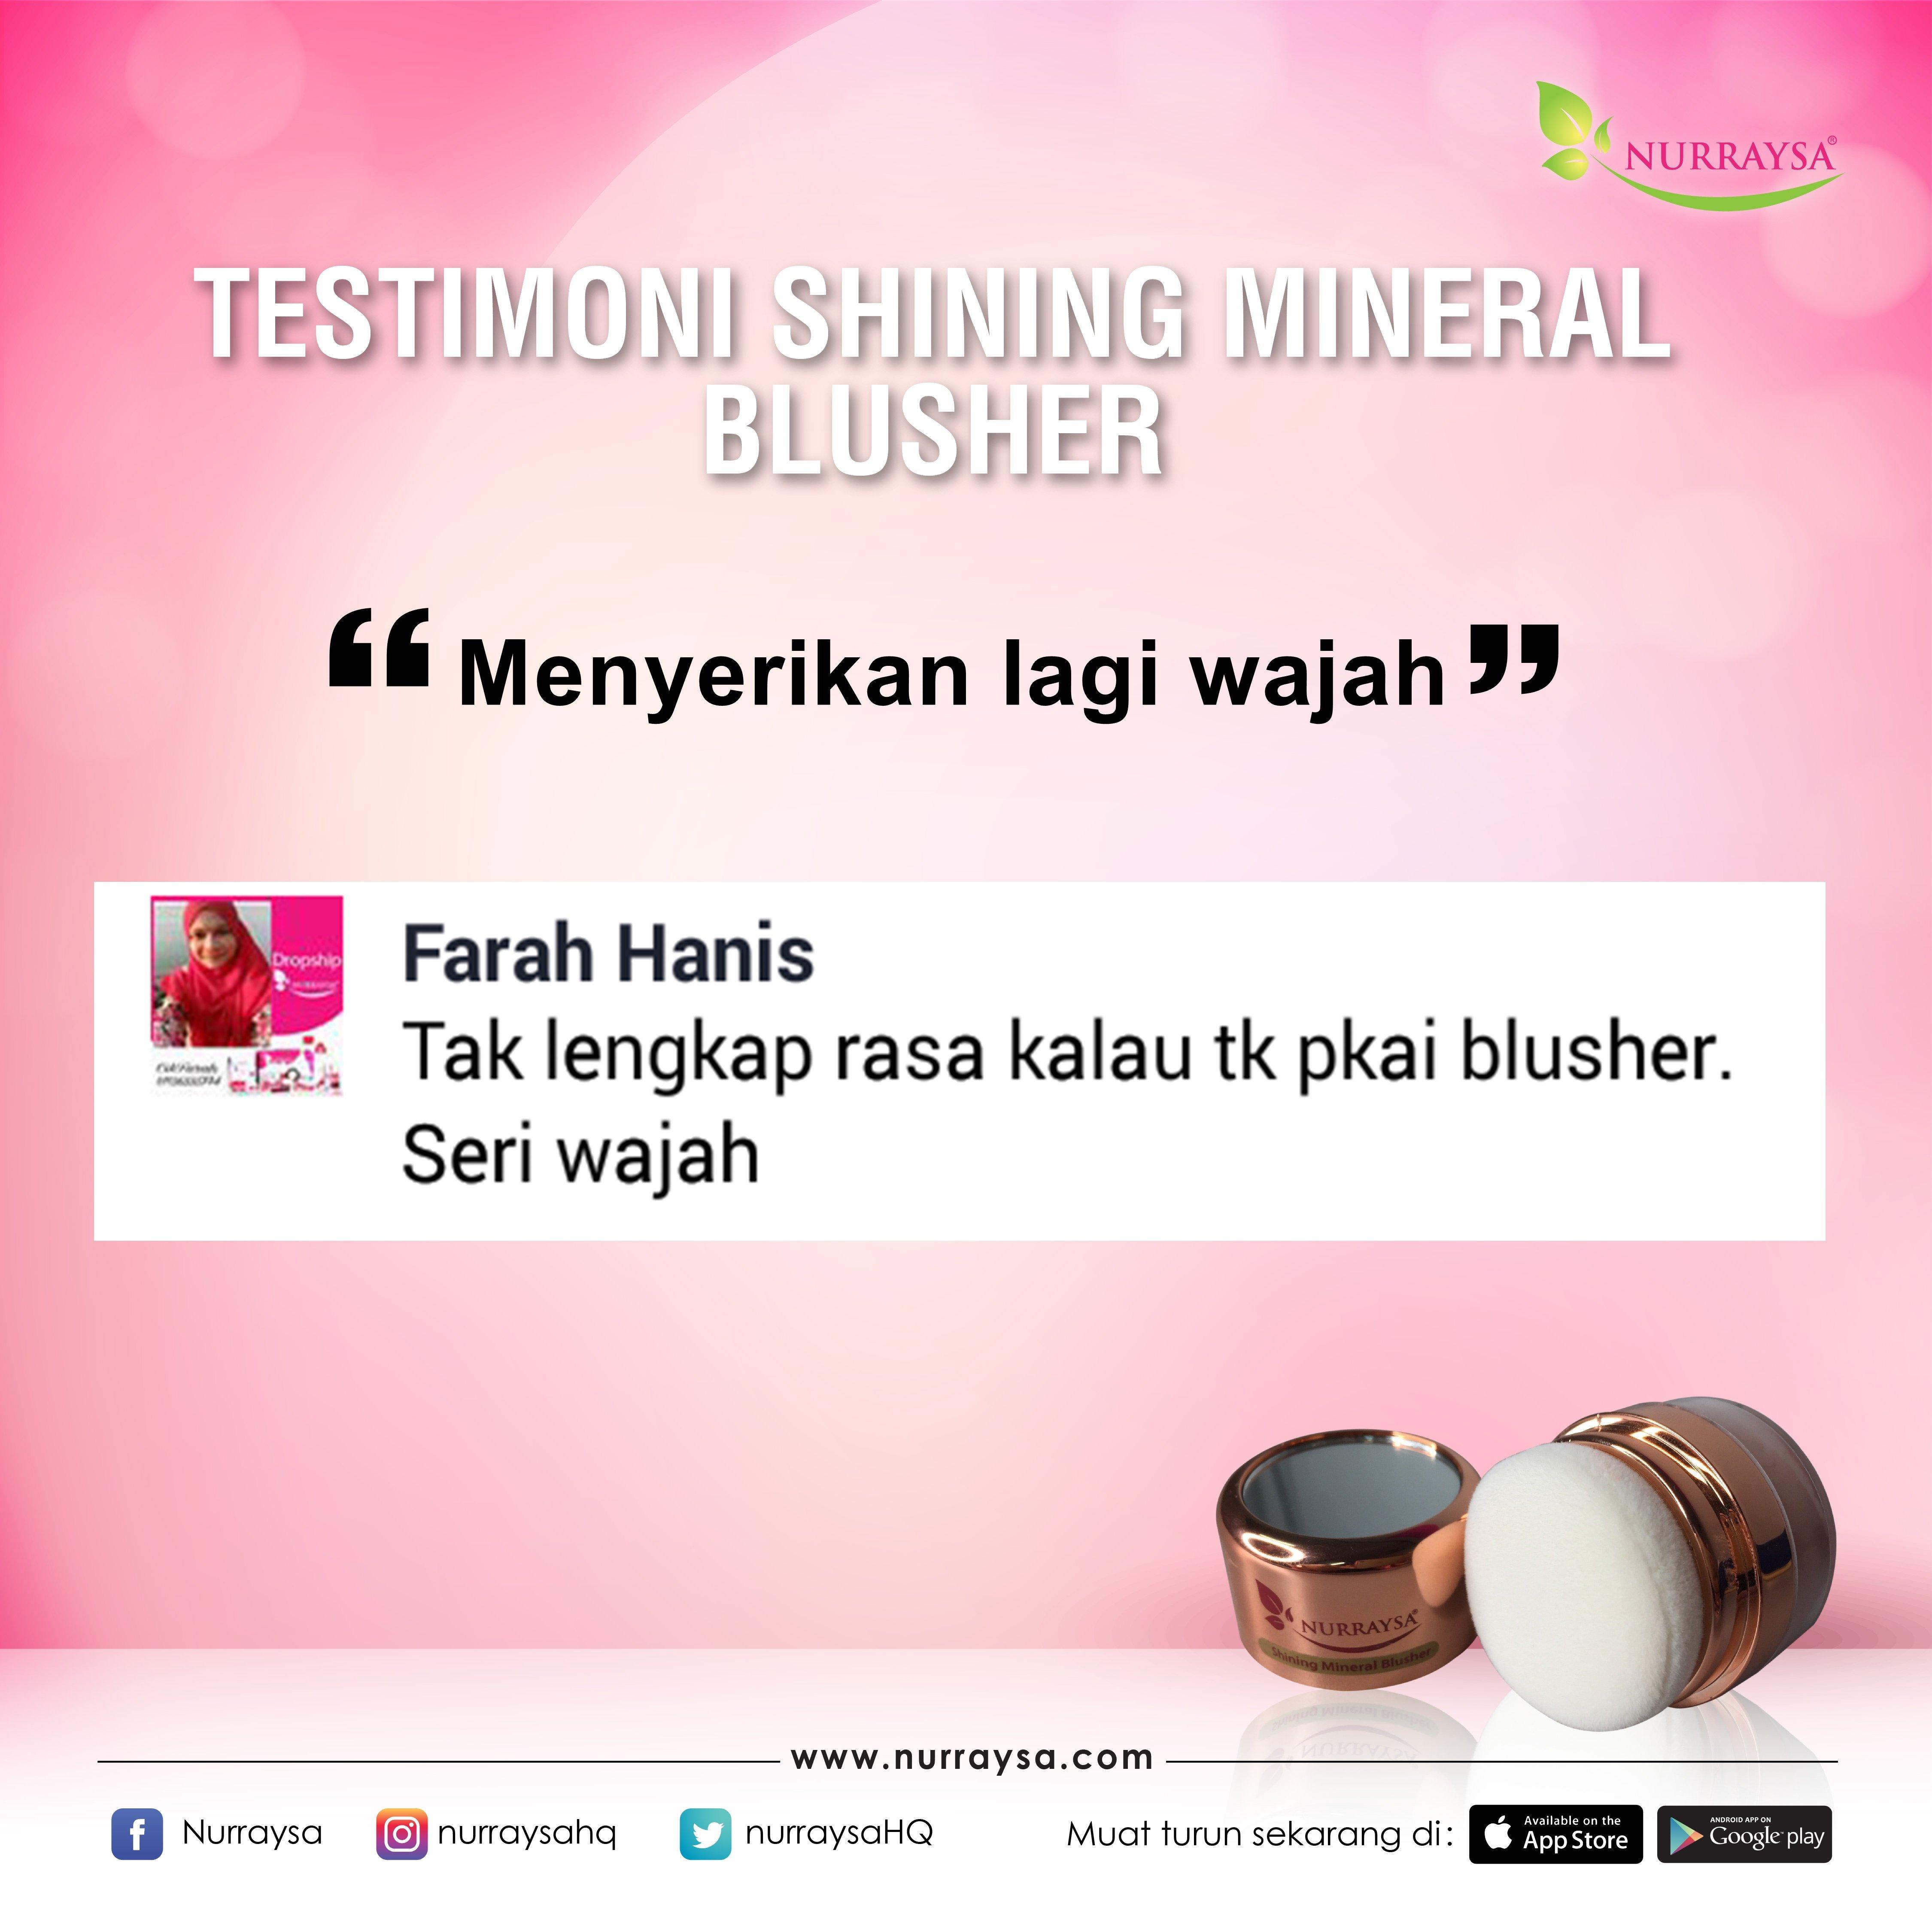 Testimoni Mineral Blusher 1